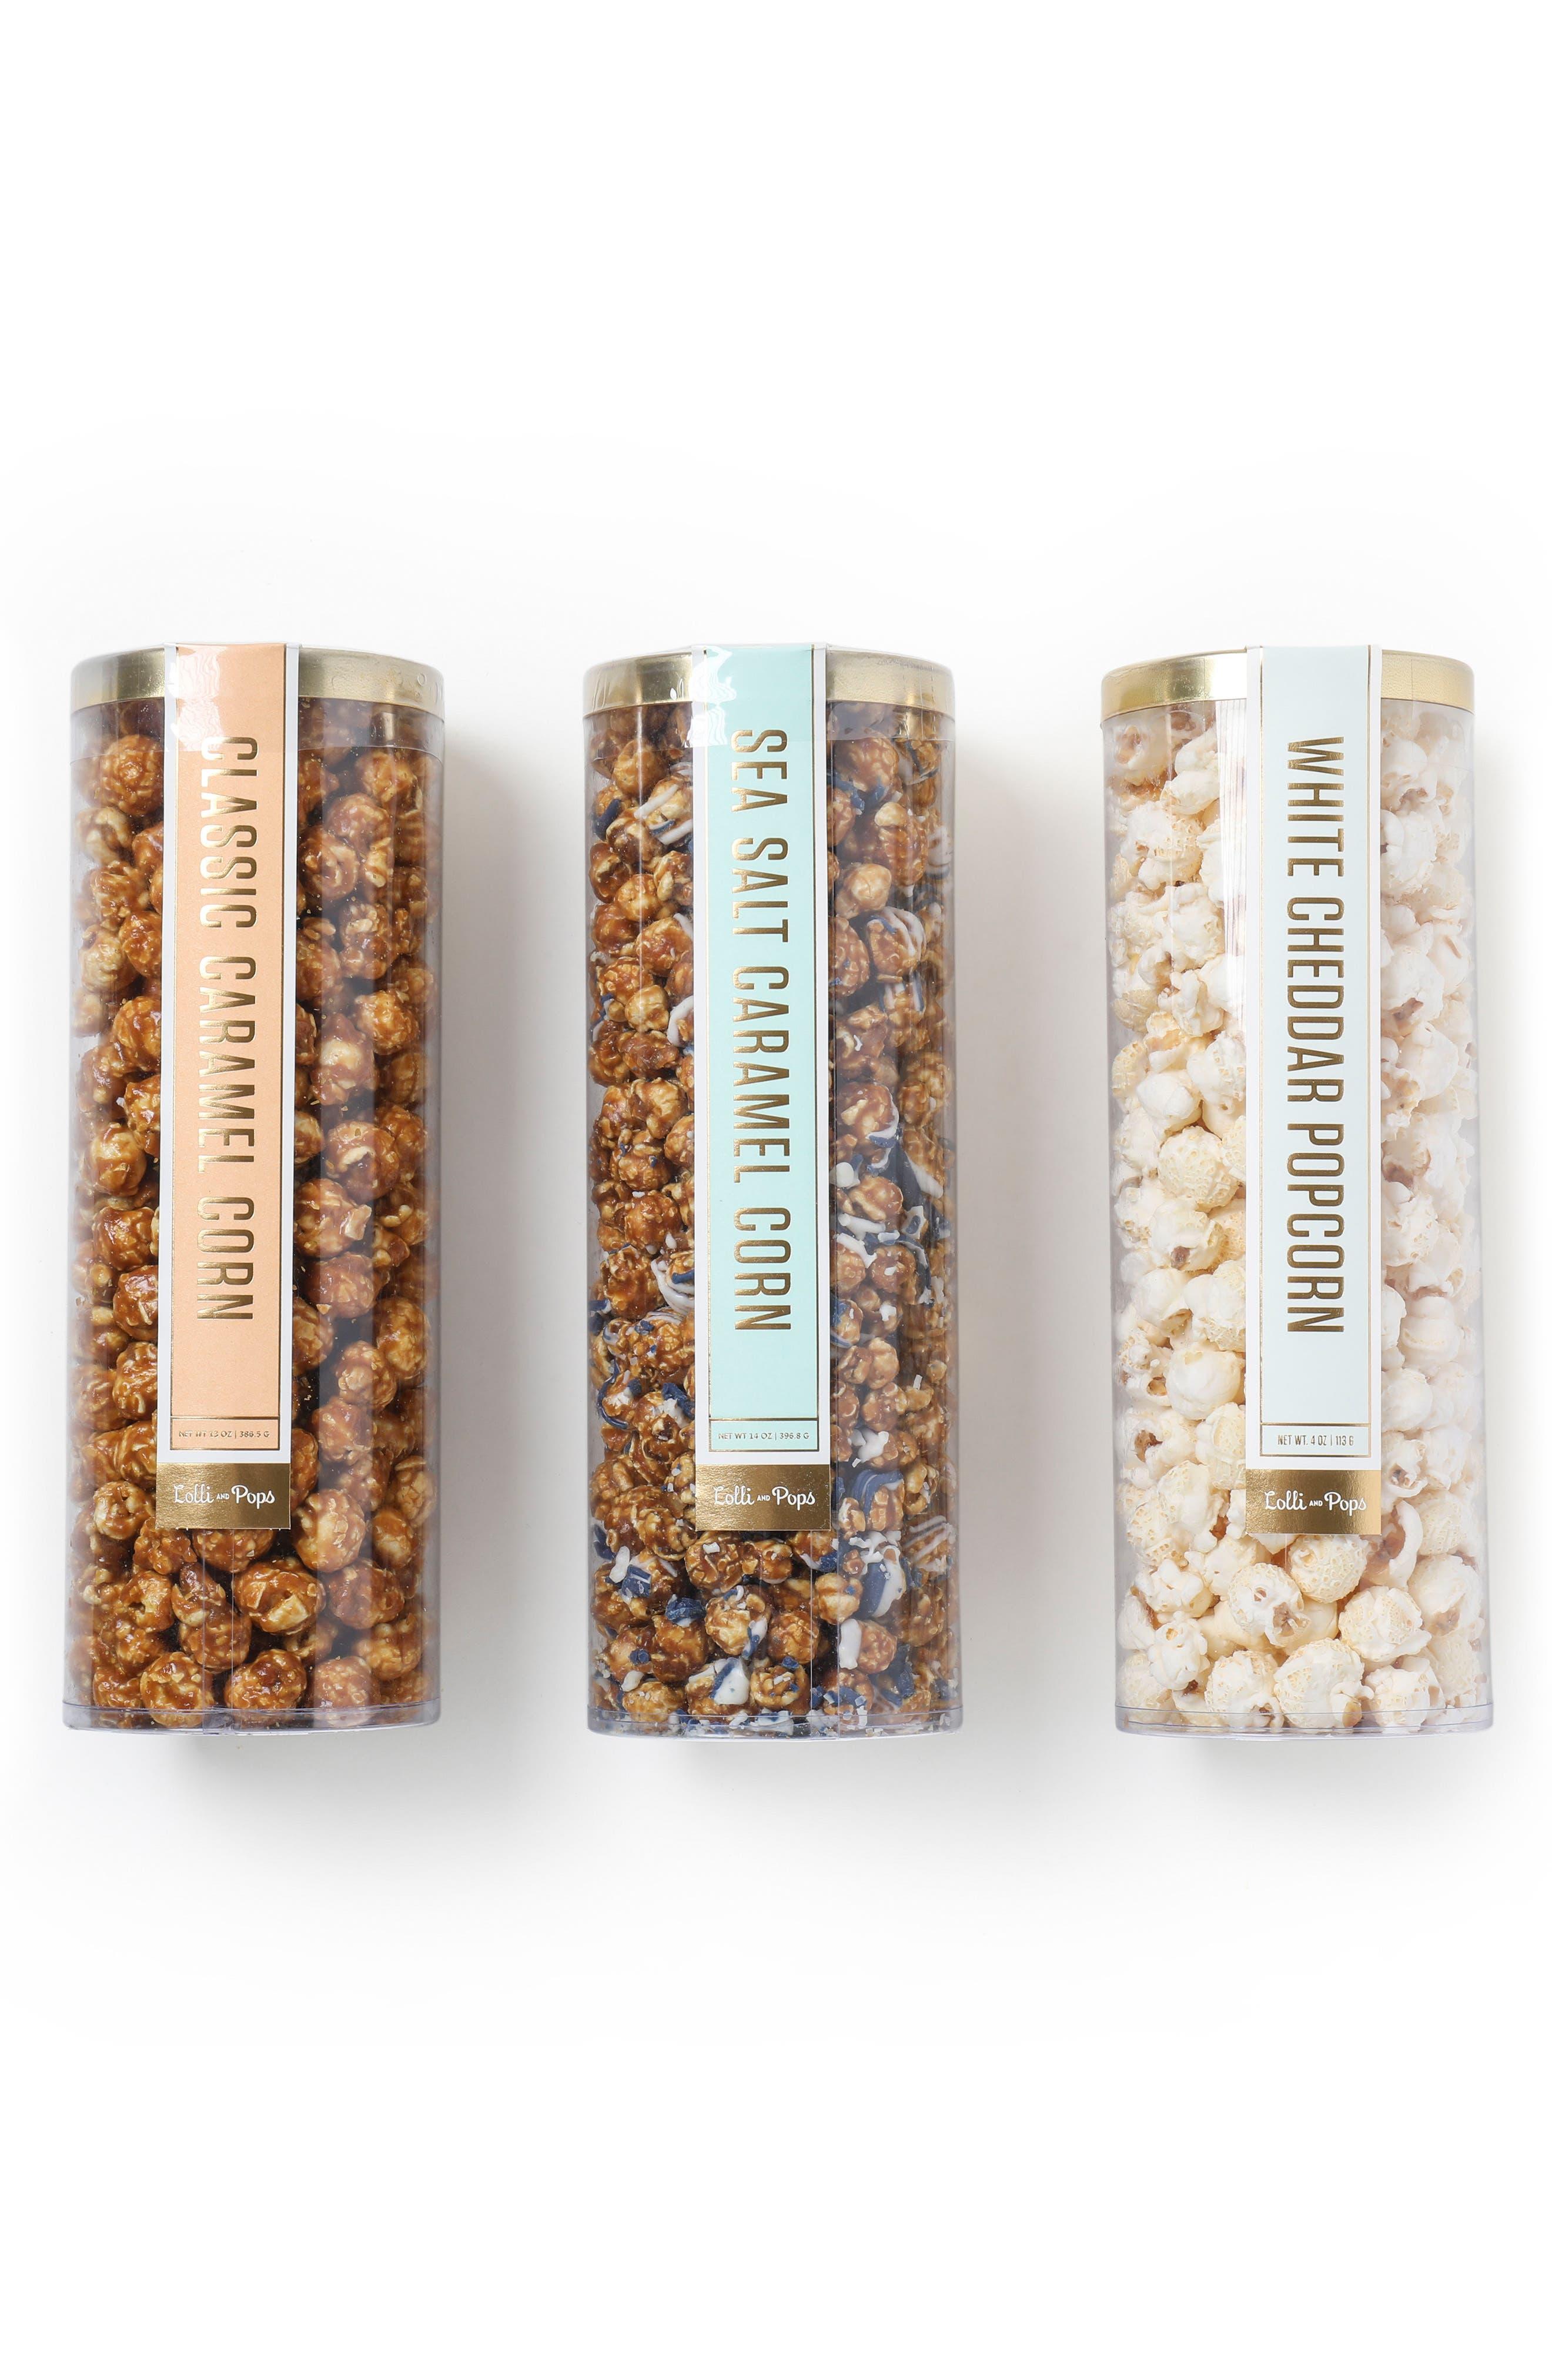 Lolli and Pops Set of 3 Popcorn Tubes